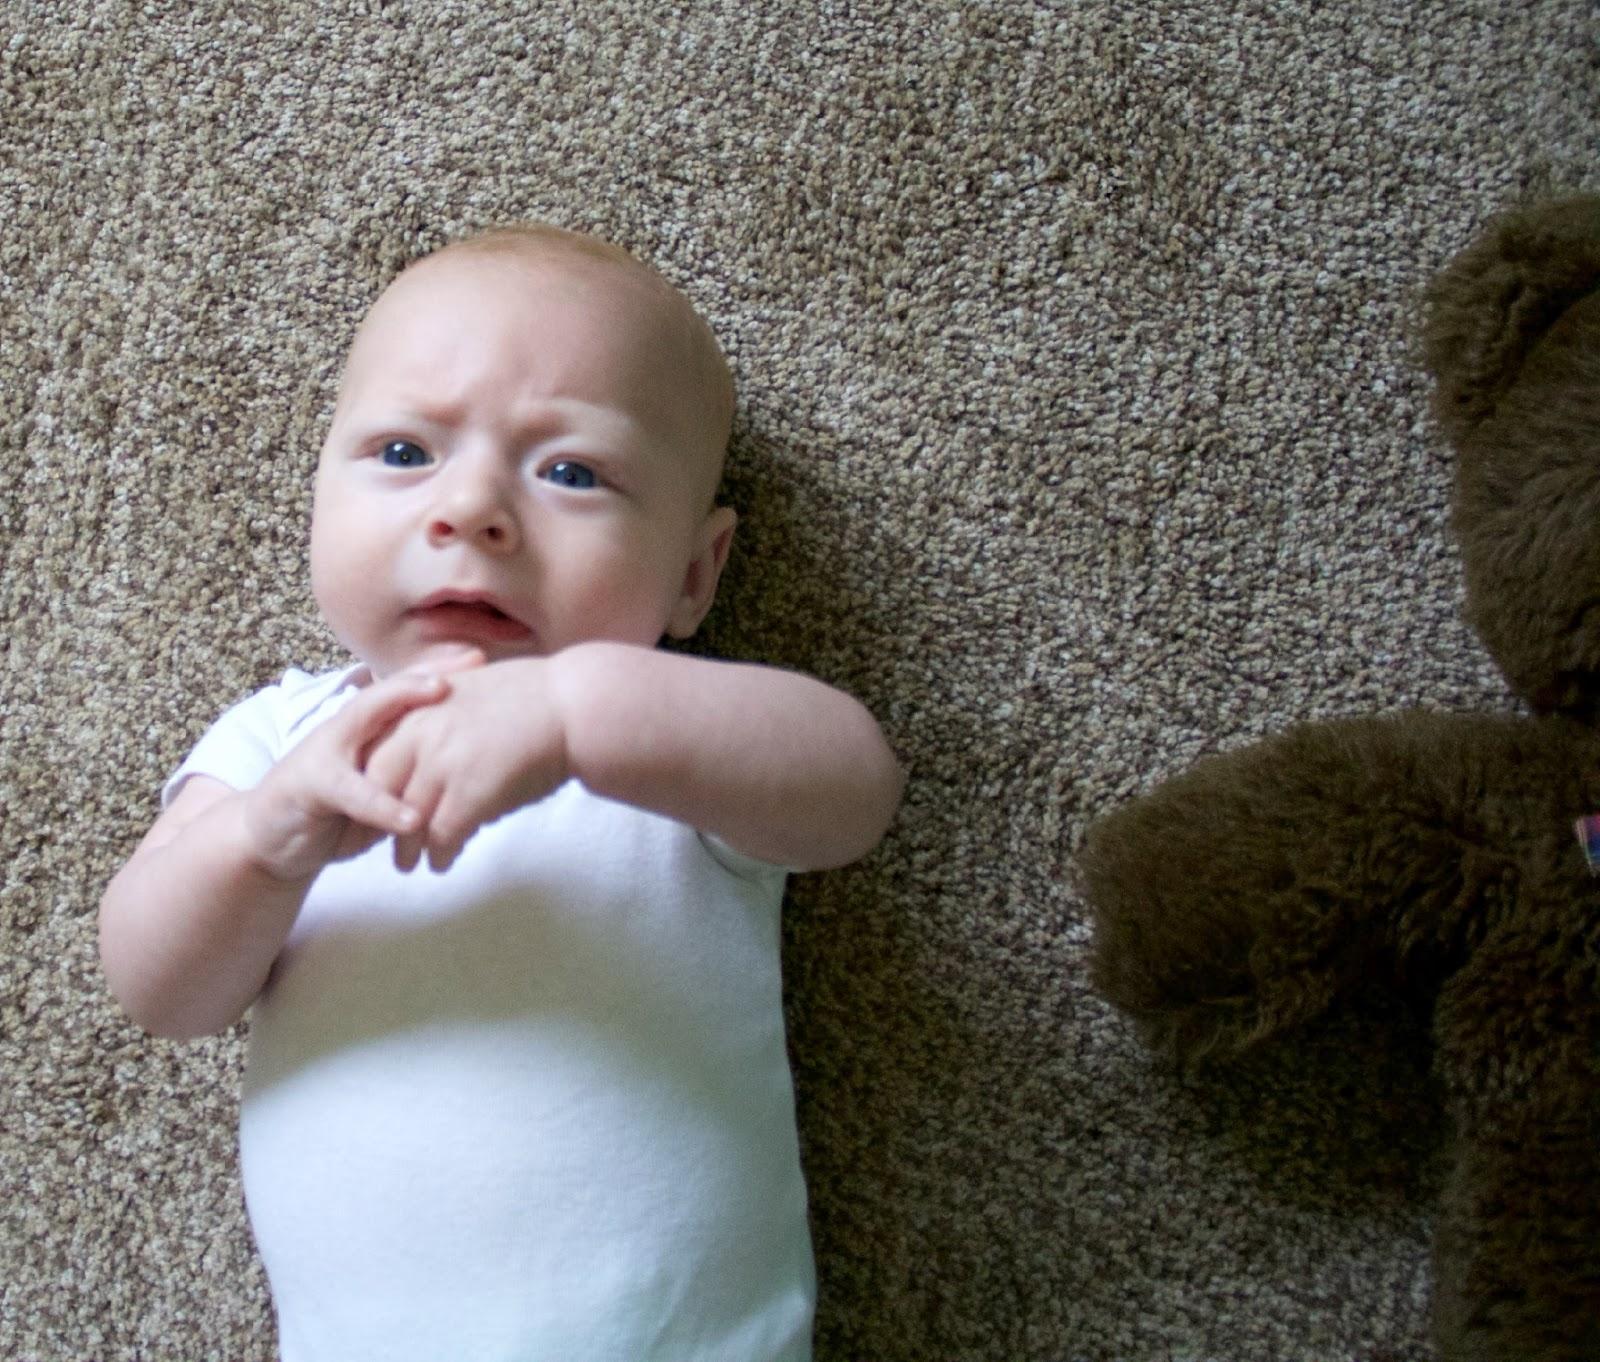 4 month old baby boy development